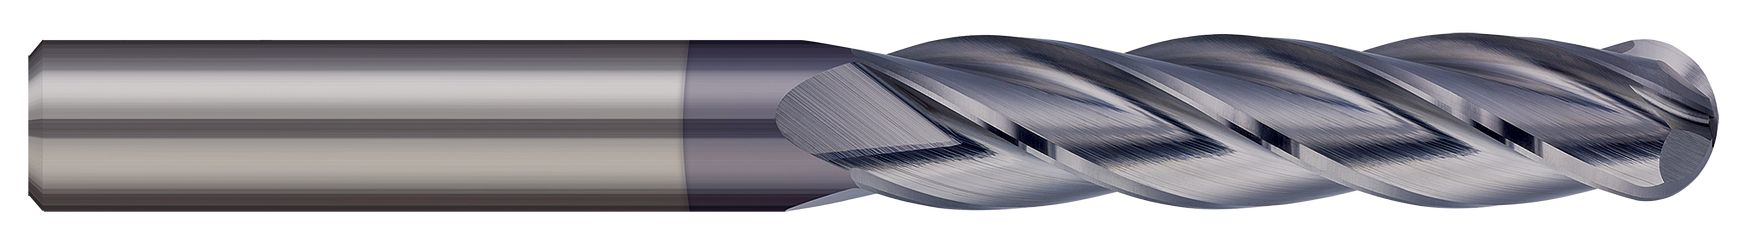 tool-details-BELM-100-2X